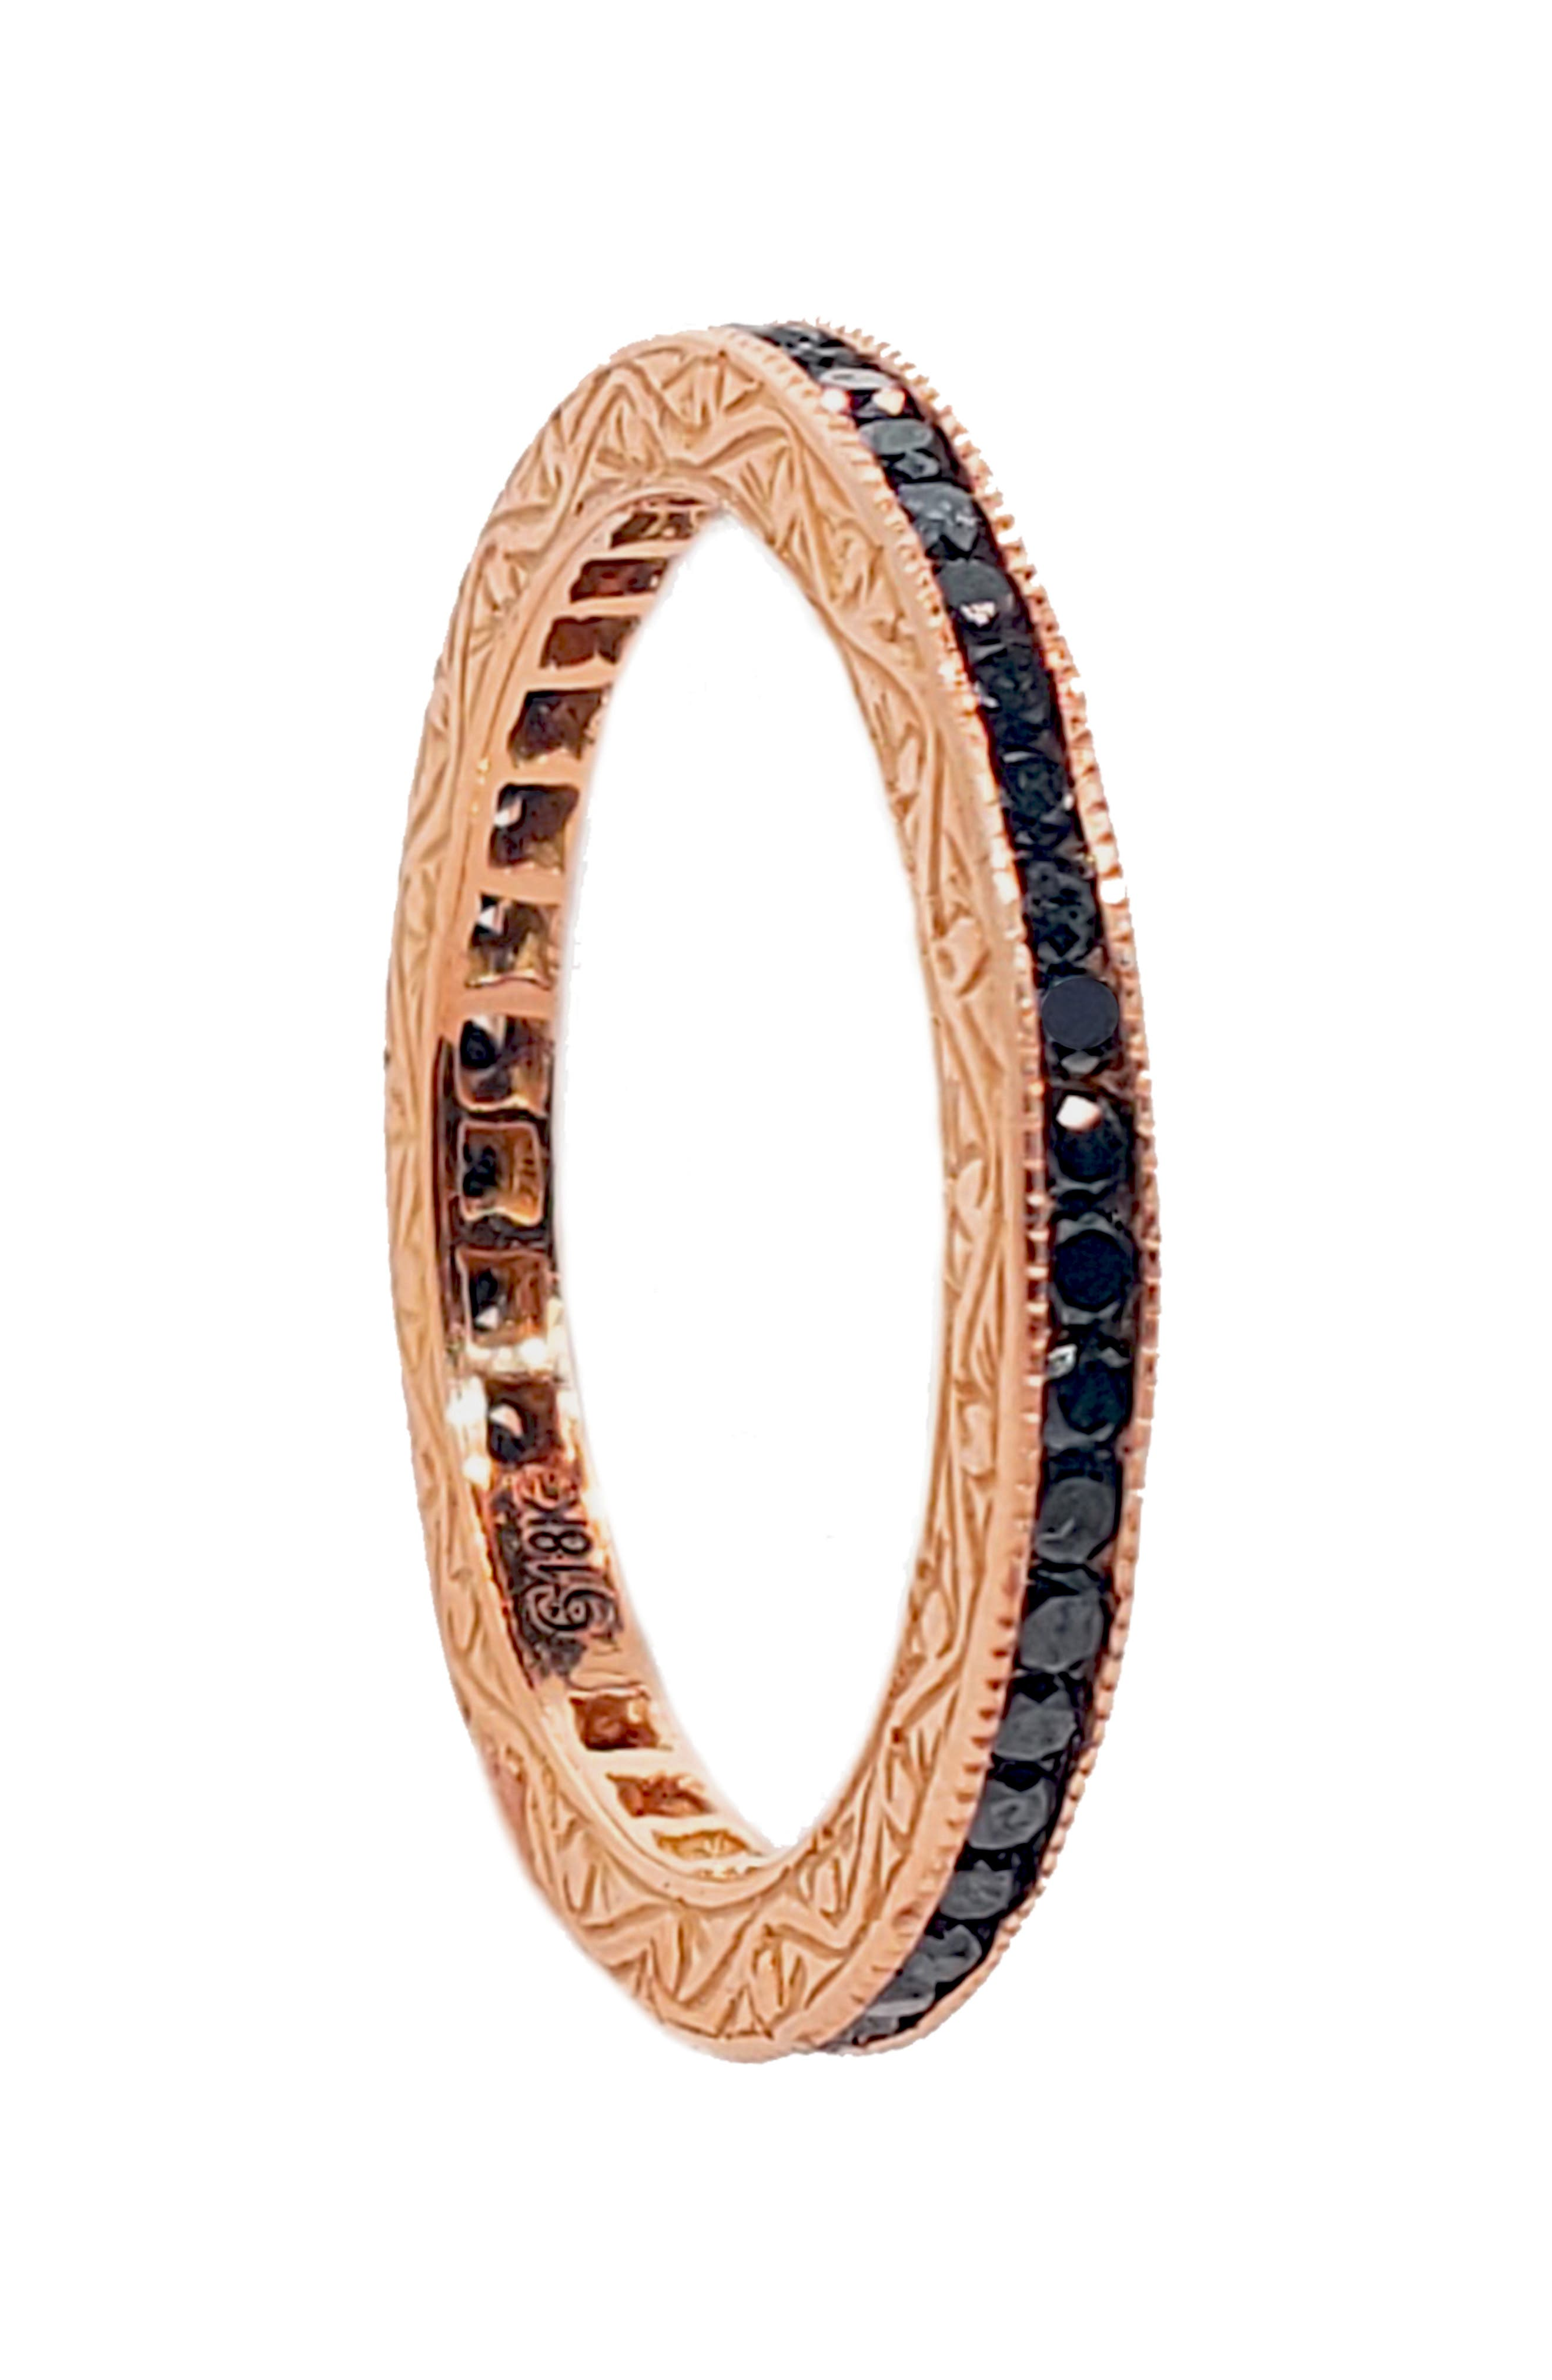 Channel Set Diamond Ring,                             Main thumbnail 1, color,                             ROSE GOLD/ BLACK DIAMOND